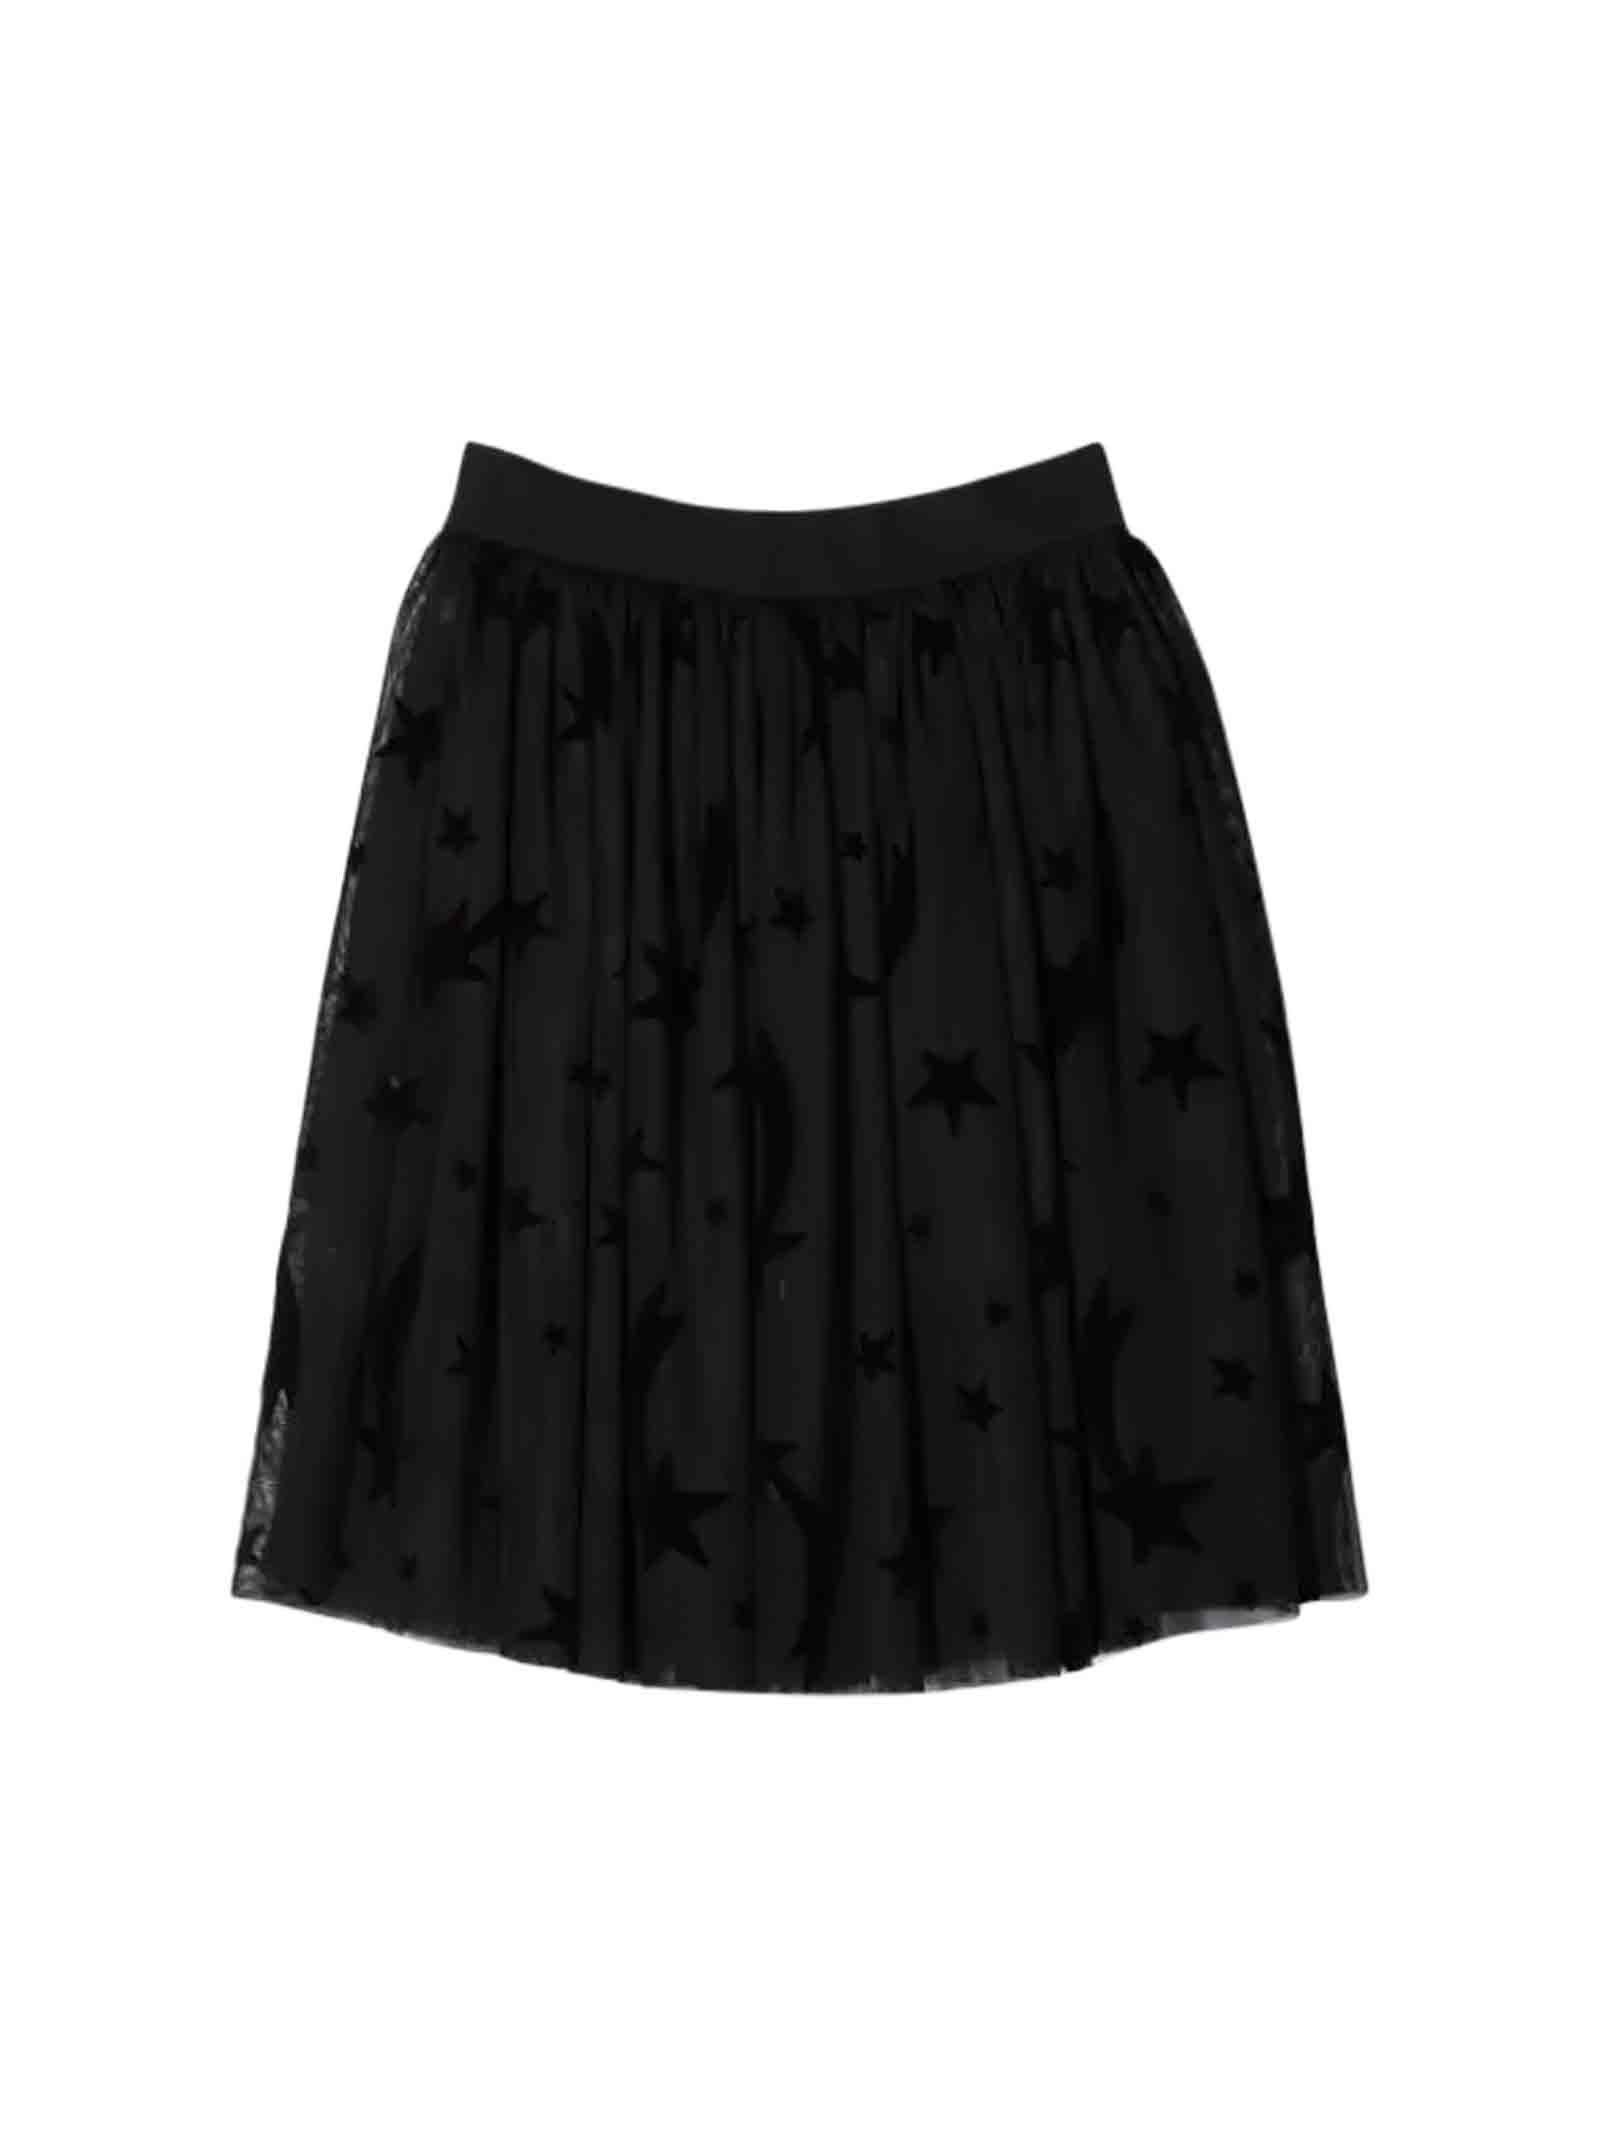 Stella McCartney Kids Black Skirt